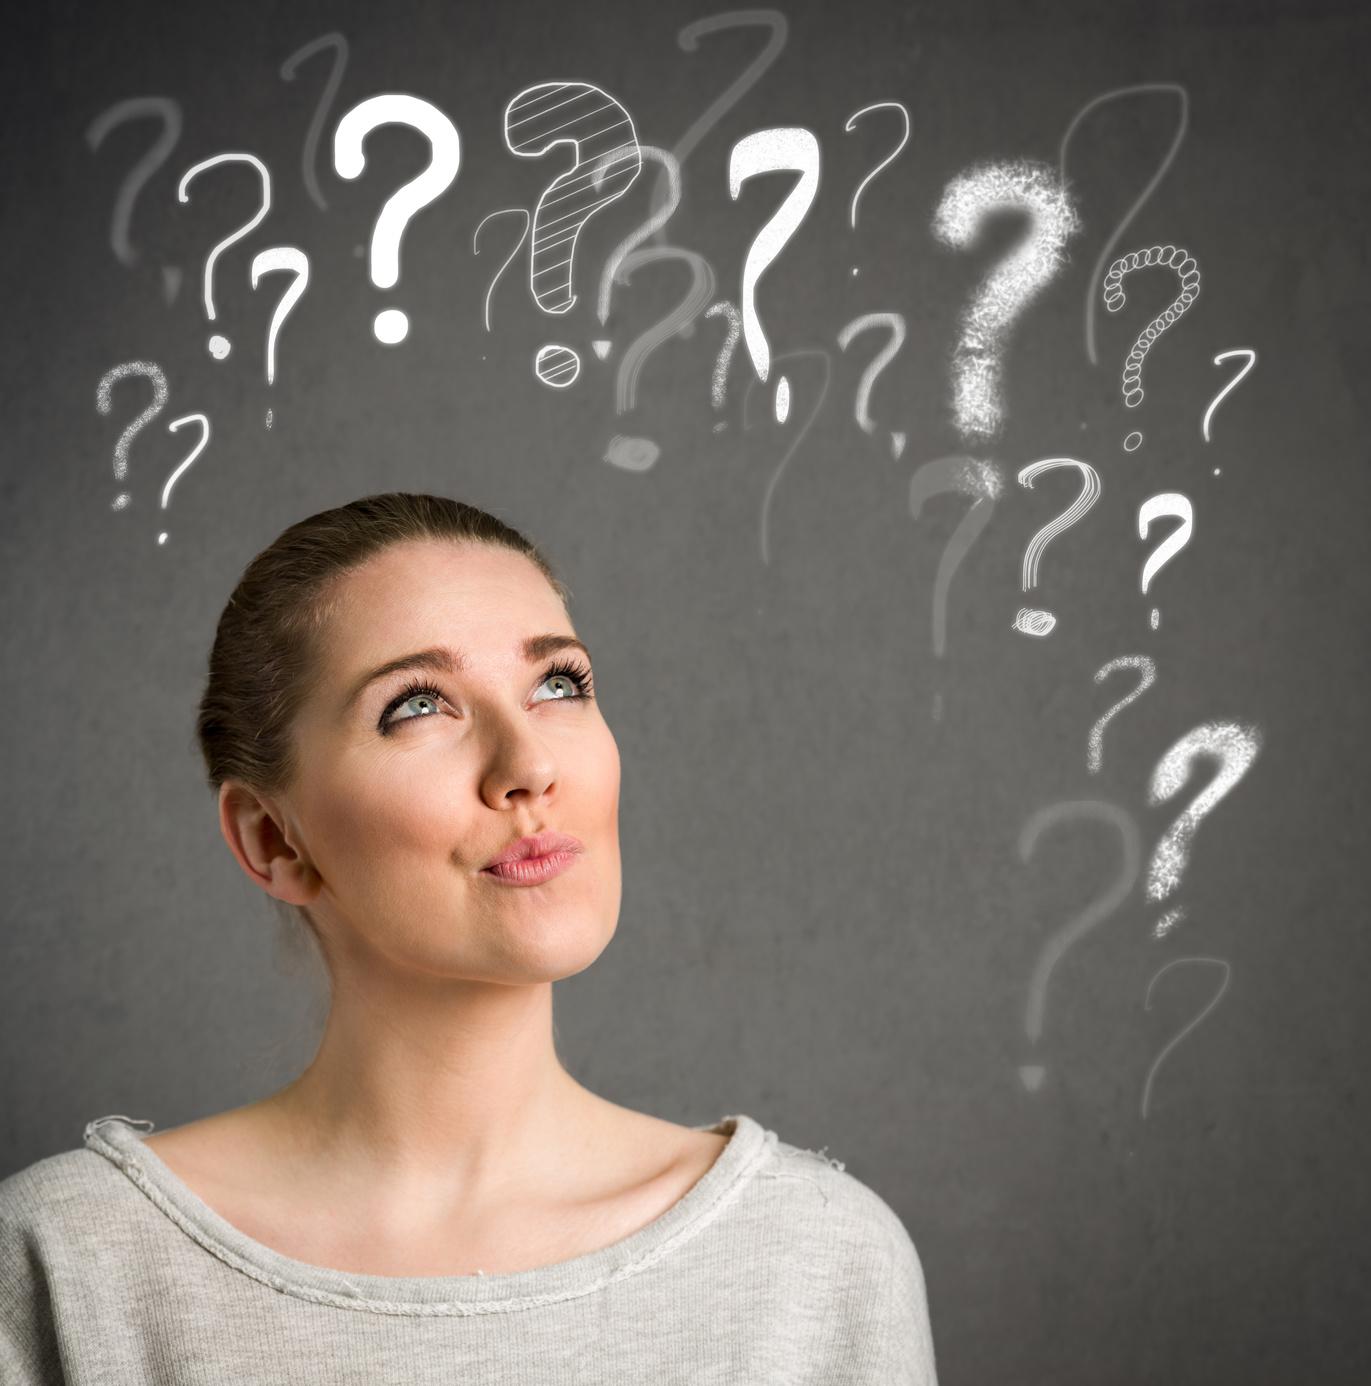 Cinq questions à poser en fin d'entretien